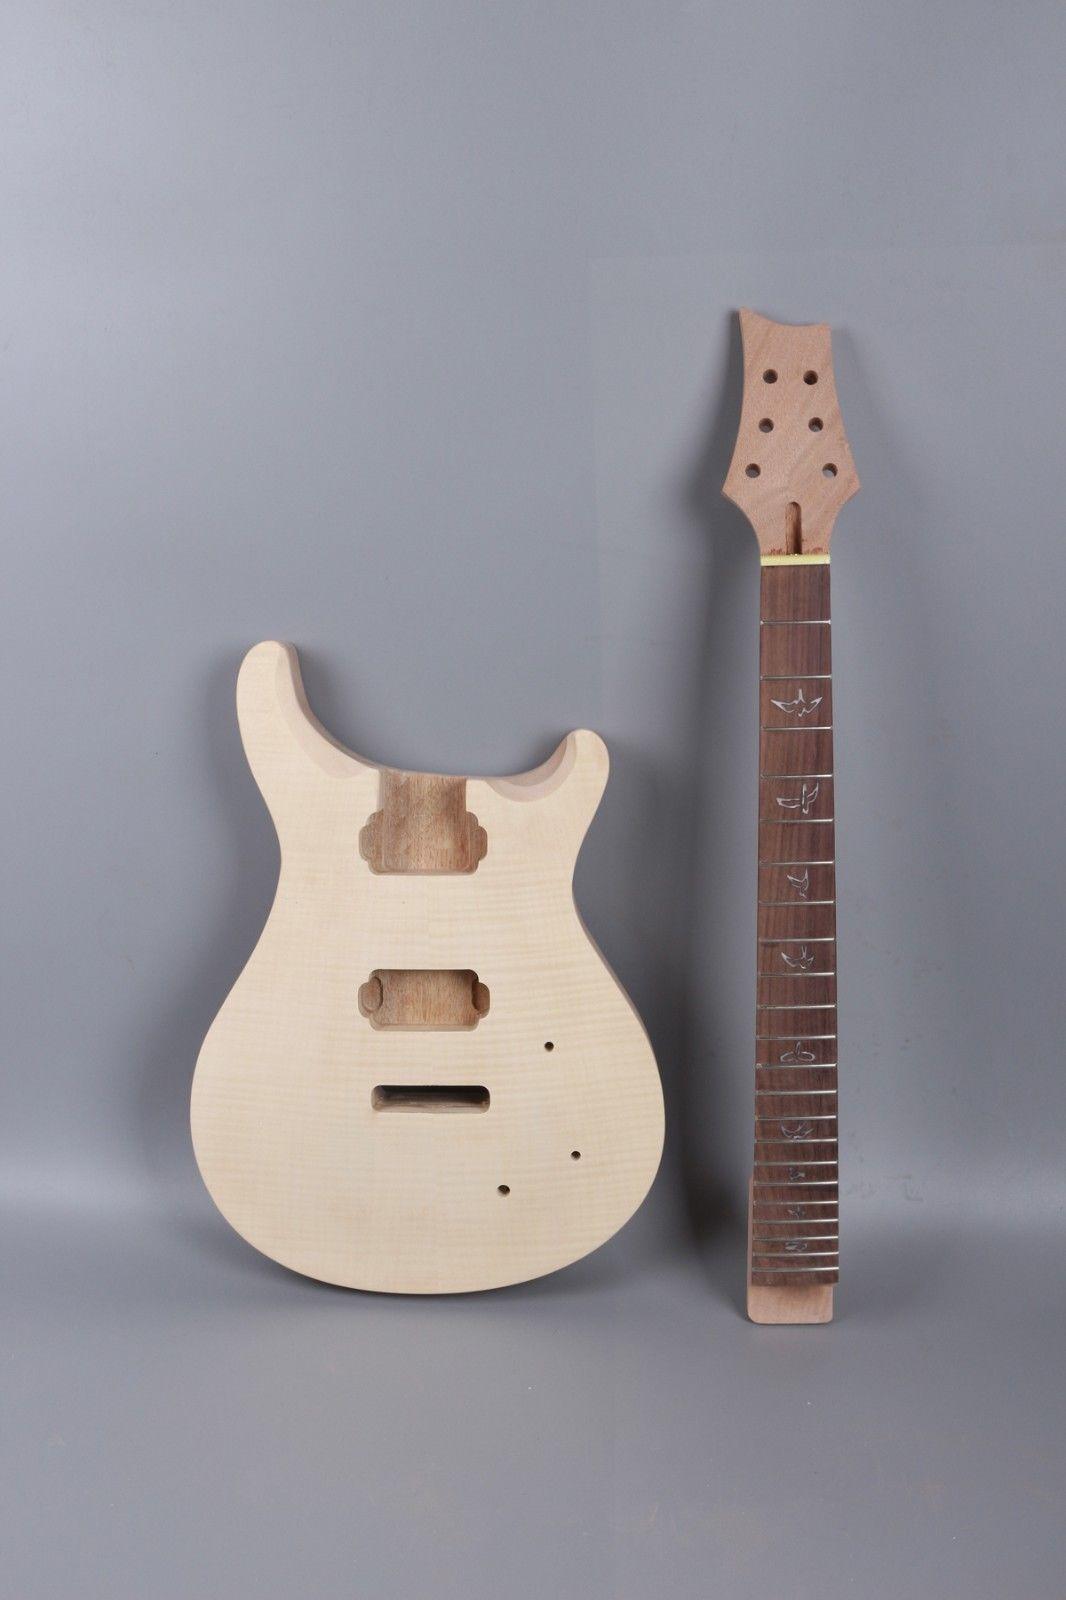 New electric guitar body Guitar neck Guitar parts 22 fret 24.75 inch DIY guitar 1pcs black guitar neck electric guitar neck solid wood 25 5 22 fret new 008